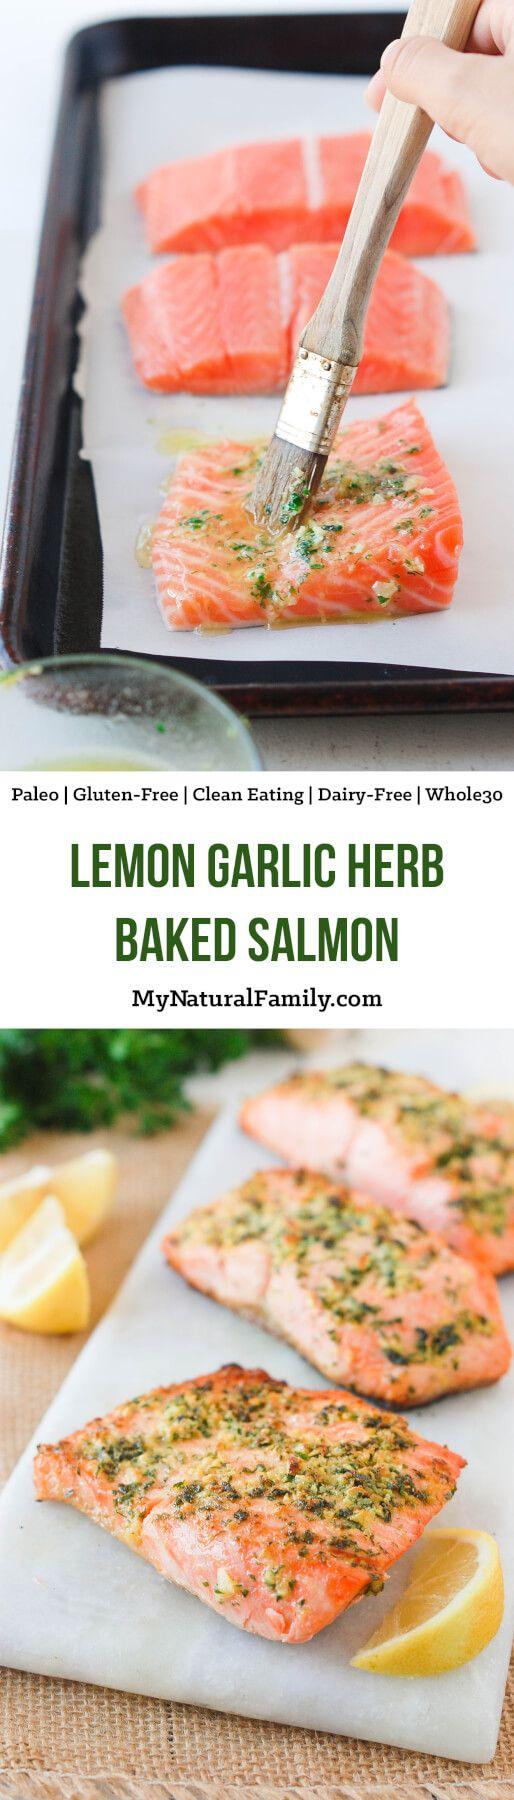 Easy Baked Fish Recipe - Lemon Garlic Herb Crusted Paleo Salmon Recipe